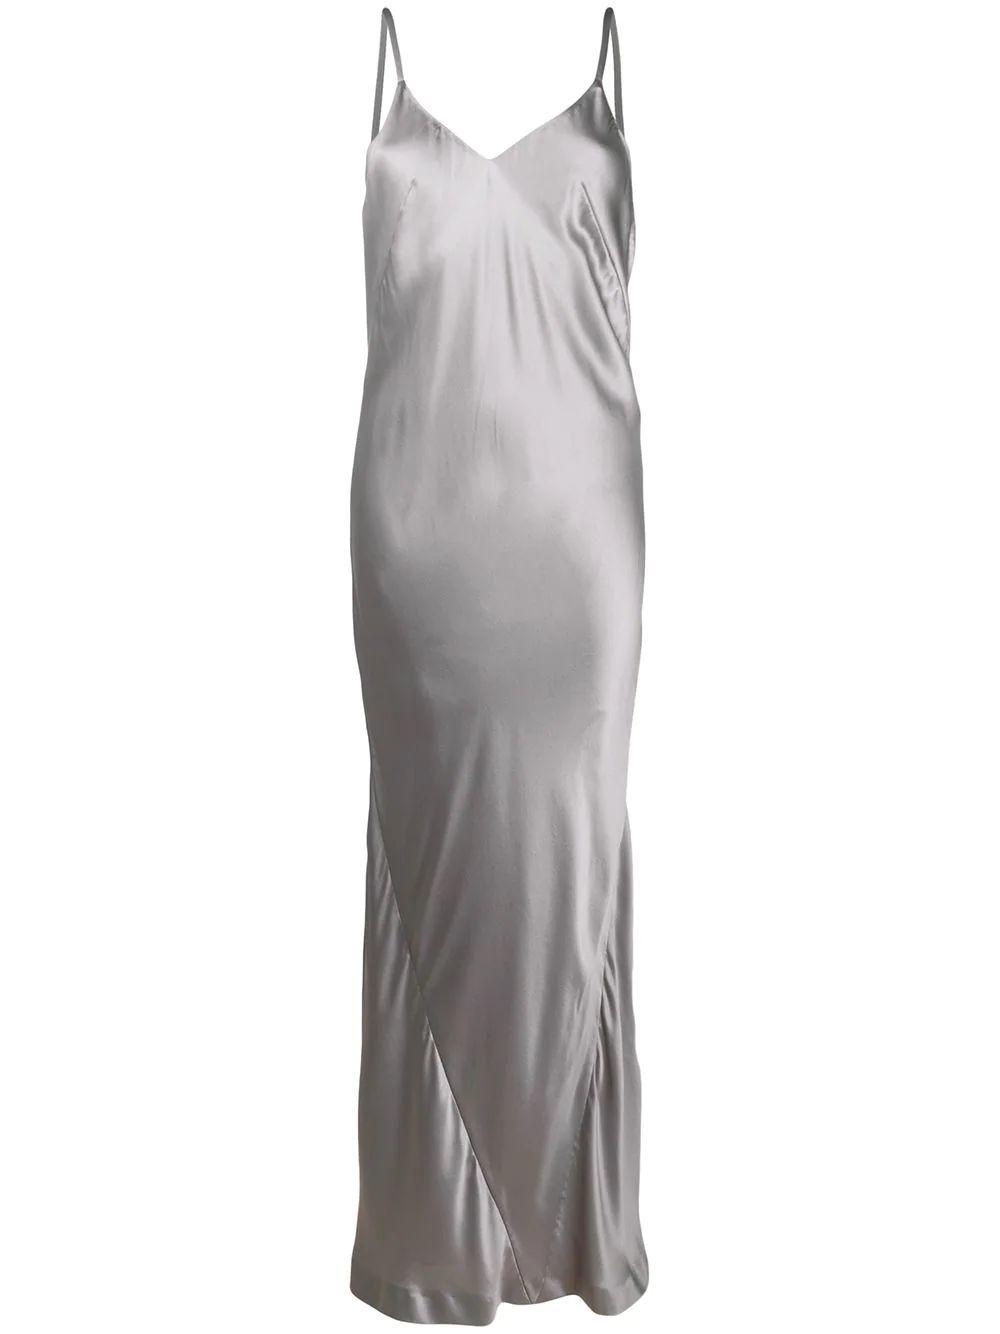 Haider Ackermann GREY SILK SLIP MAXI DRESS